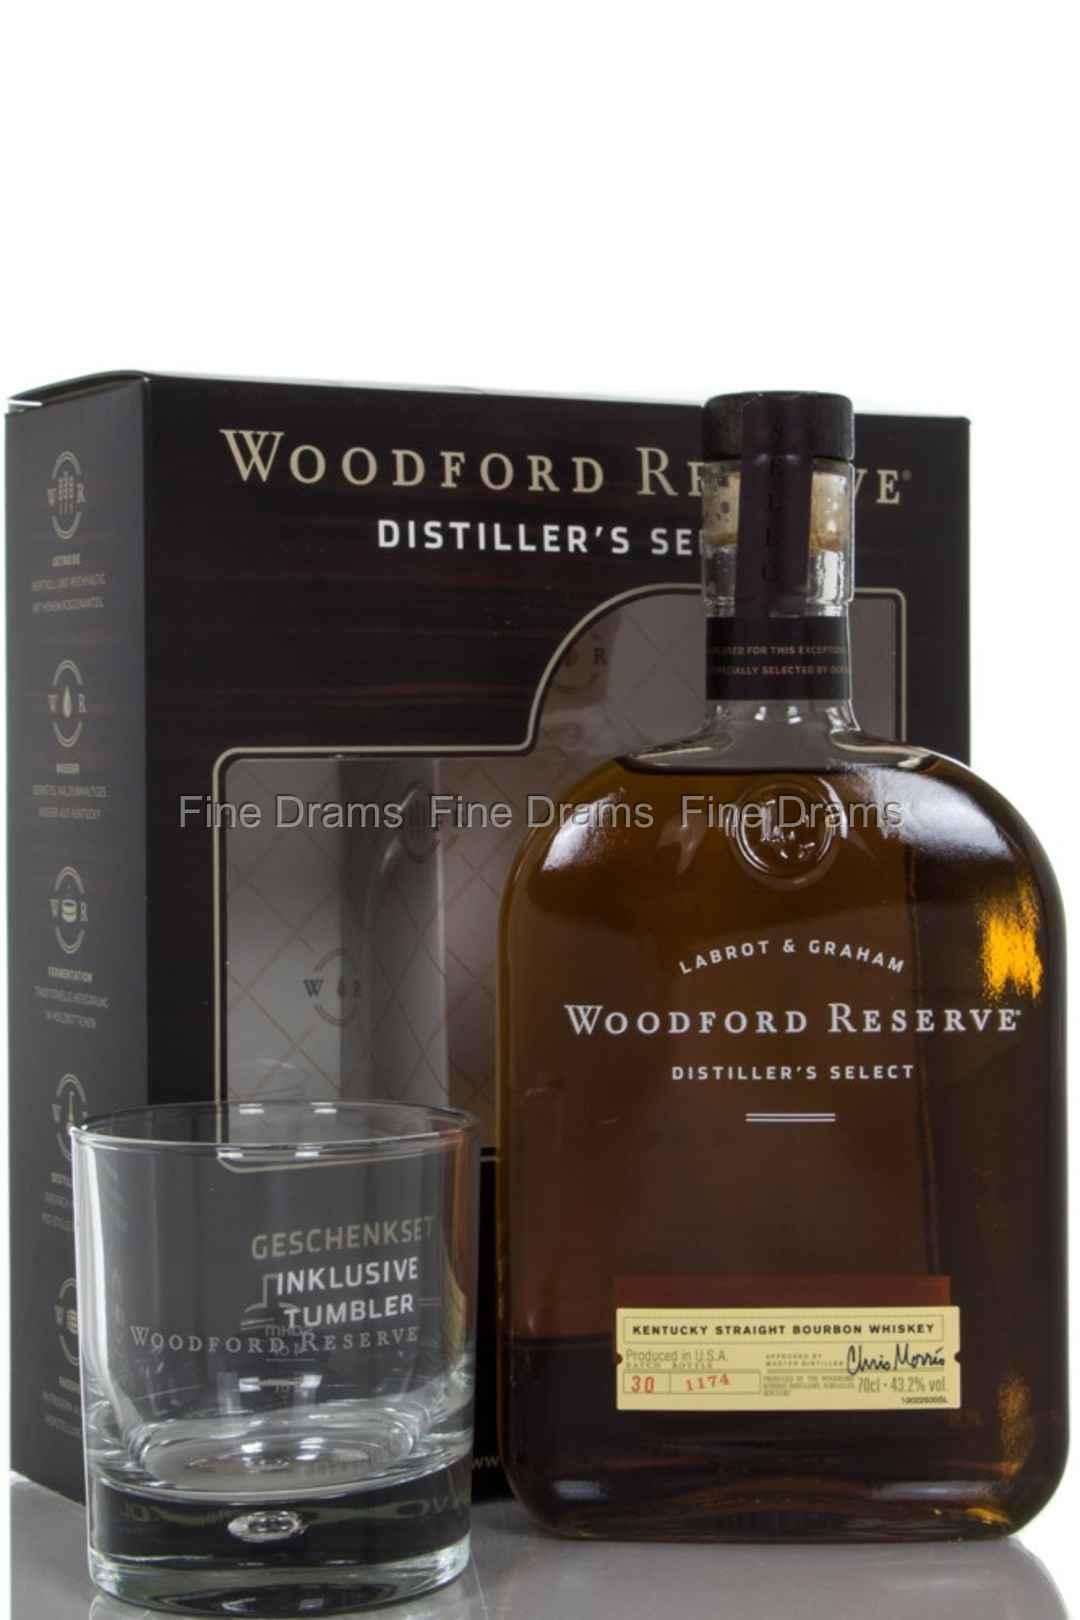 Faszinierend Woodford Galerie Von Reserve Gift Pack - 1 Glass